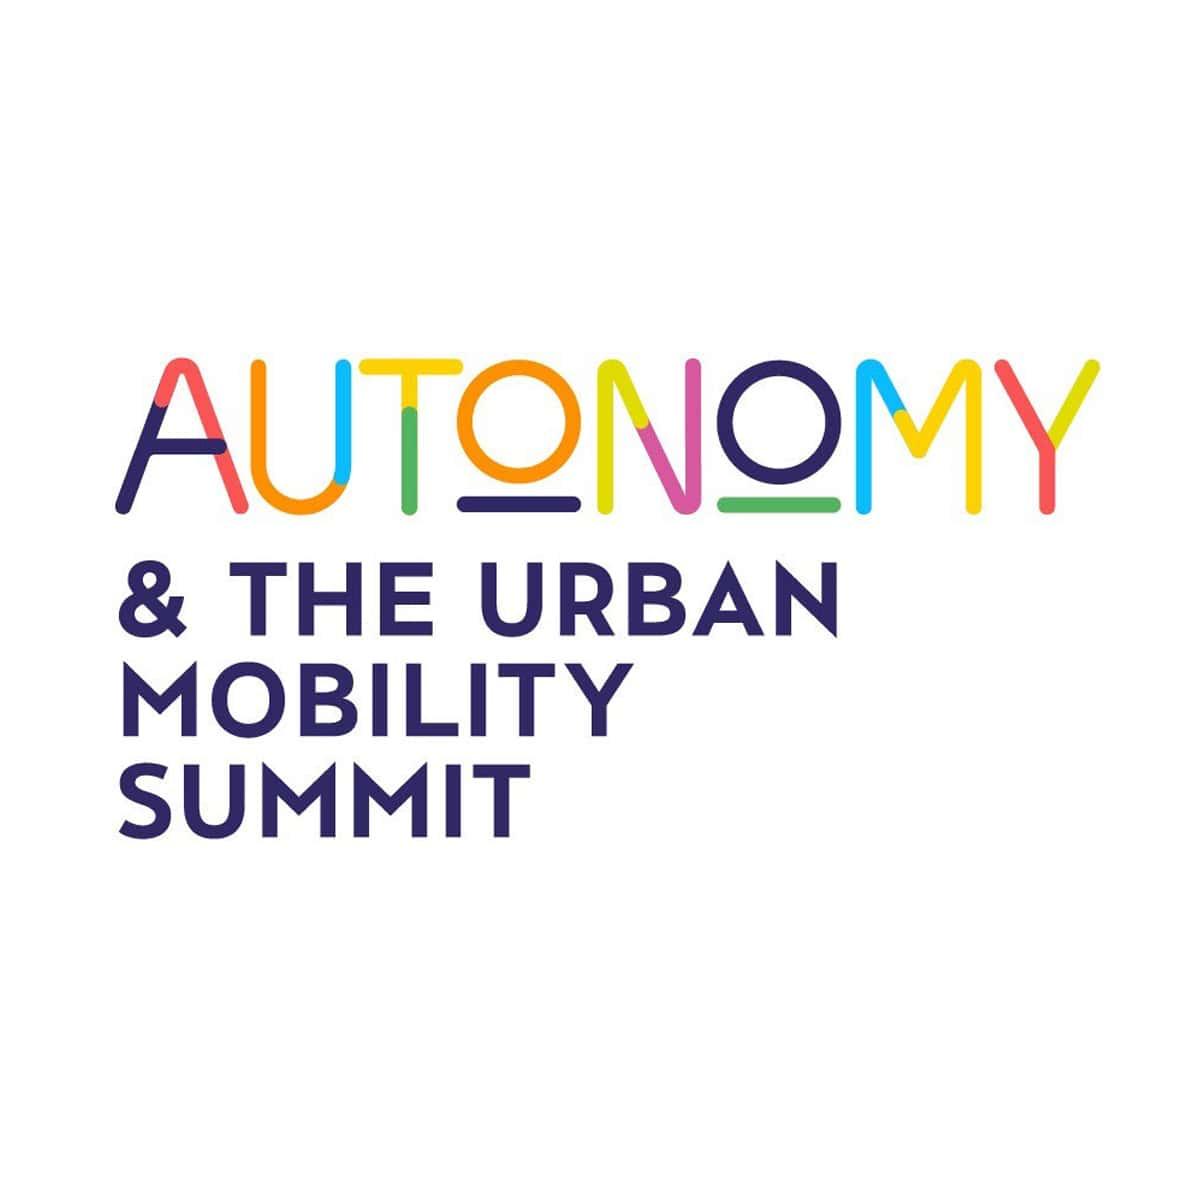 autonomy - wallbox - stazioni di ricarica - colonnine - caricatore macchina elettrica